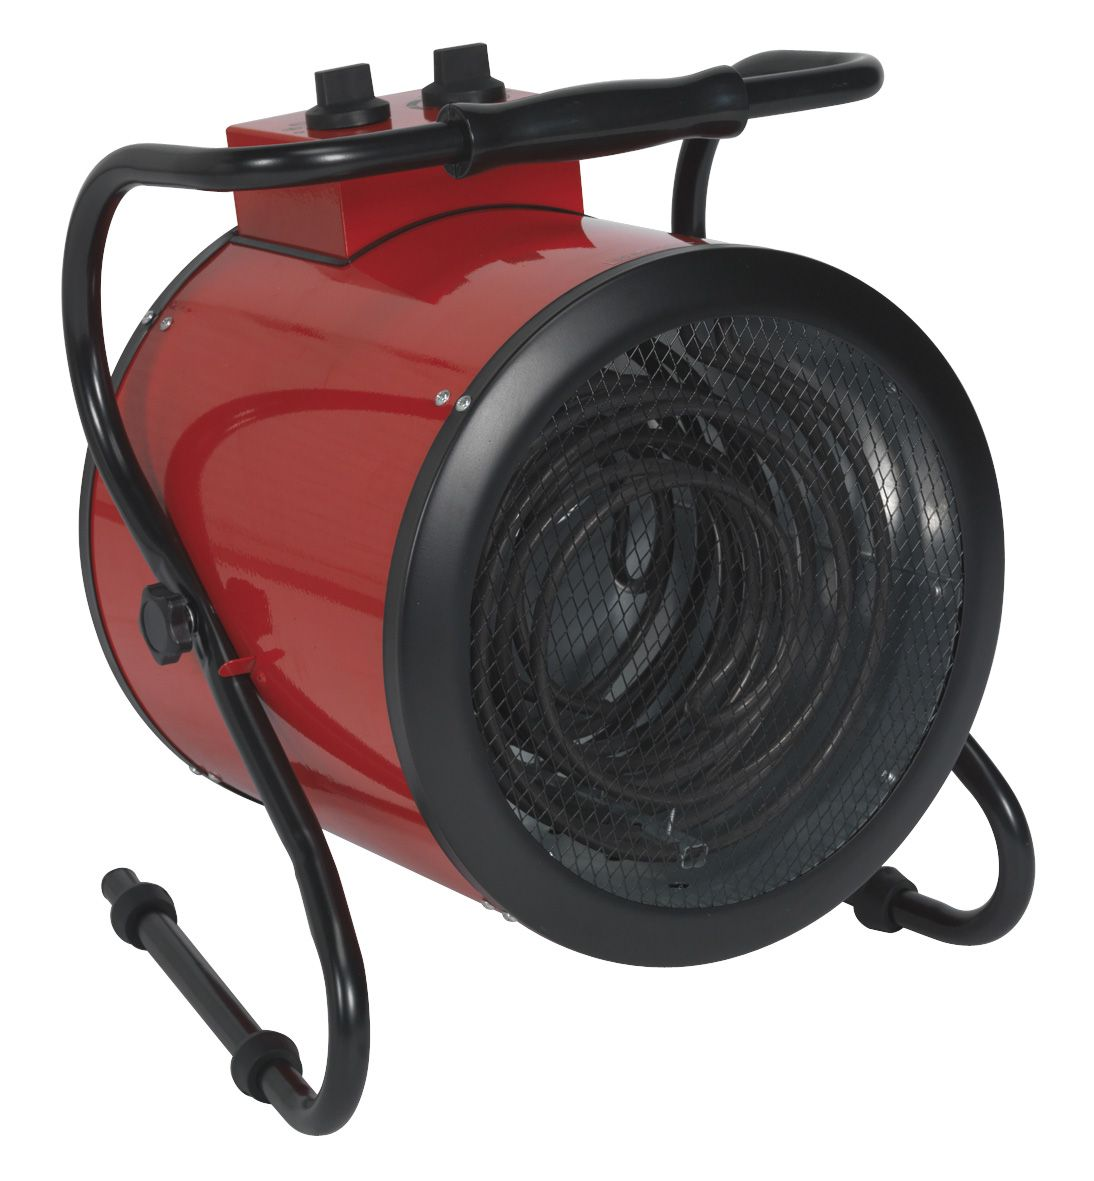 Sealey EH9001 Industrial 9kW Fan Heater 415v 3 Phase